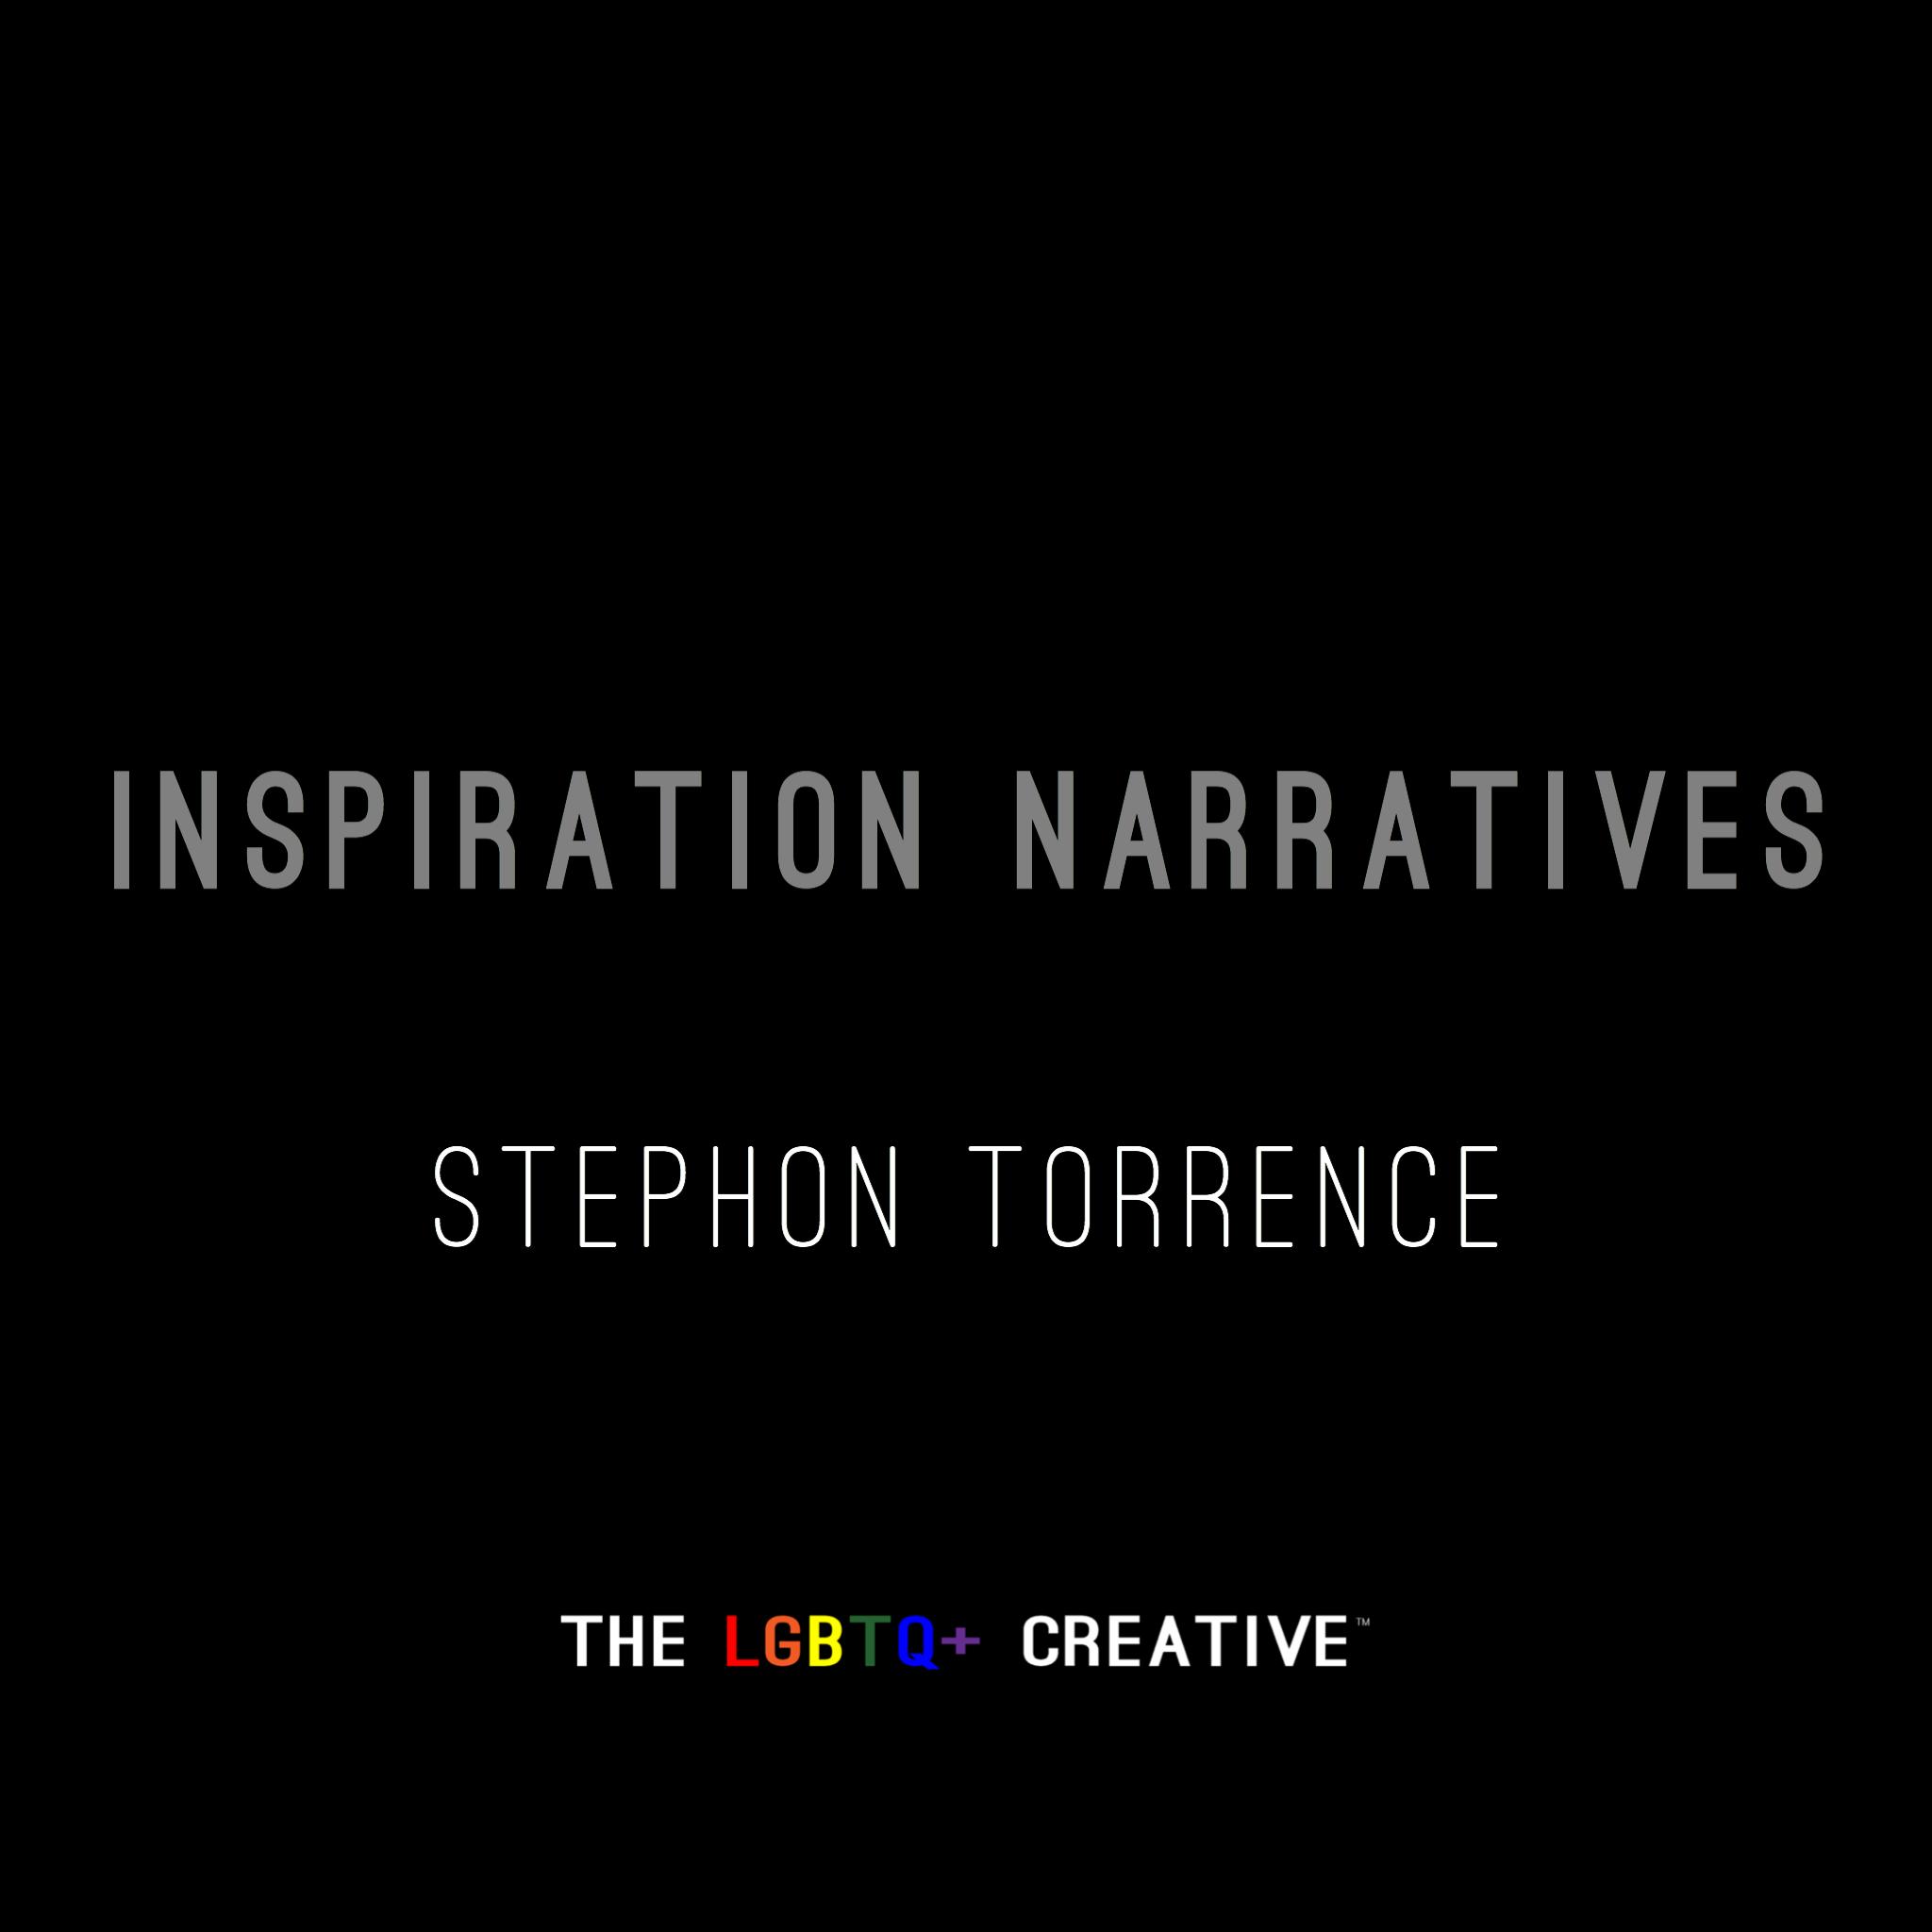 Inspiration Narratives - Stephon Torrence